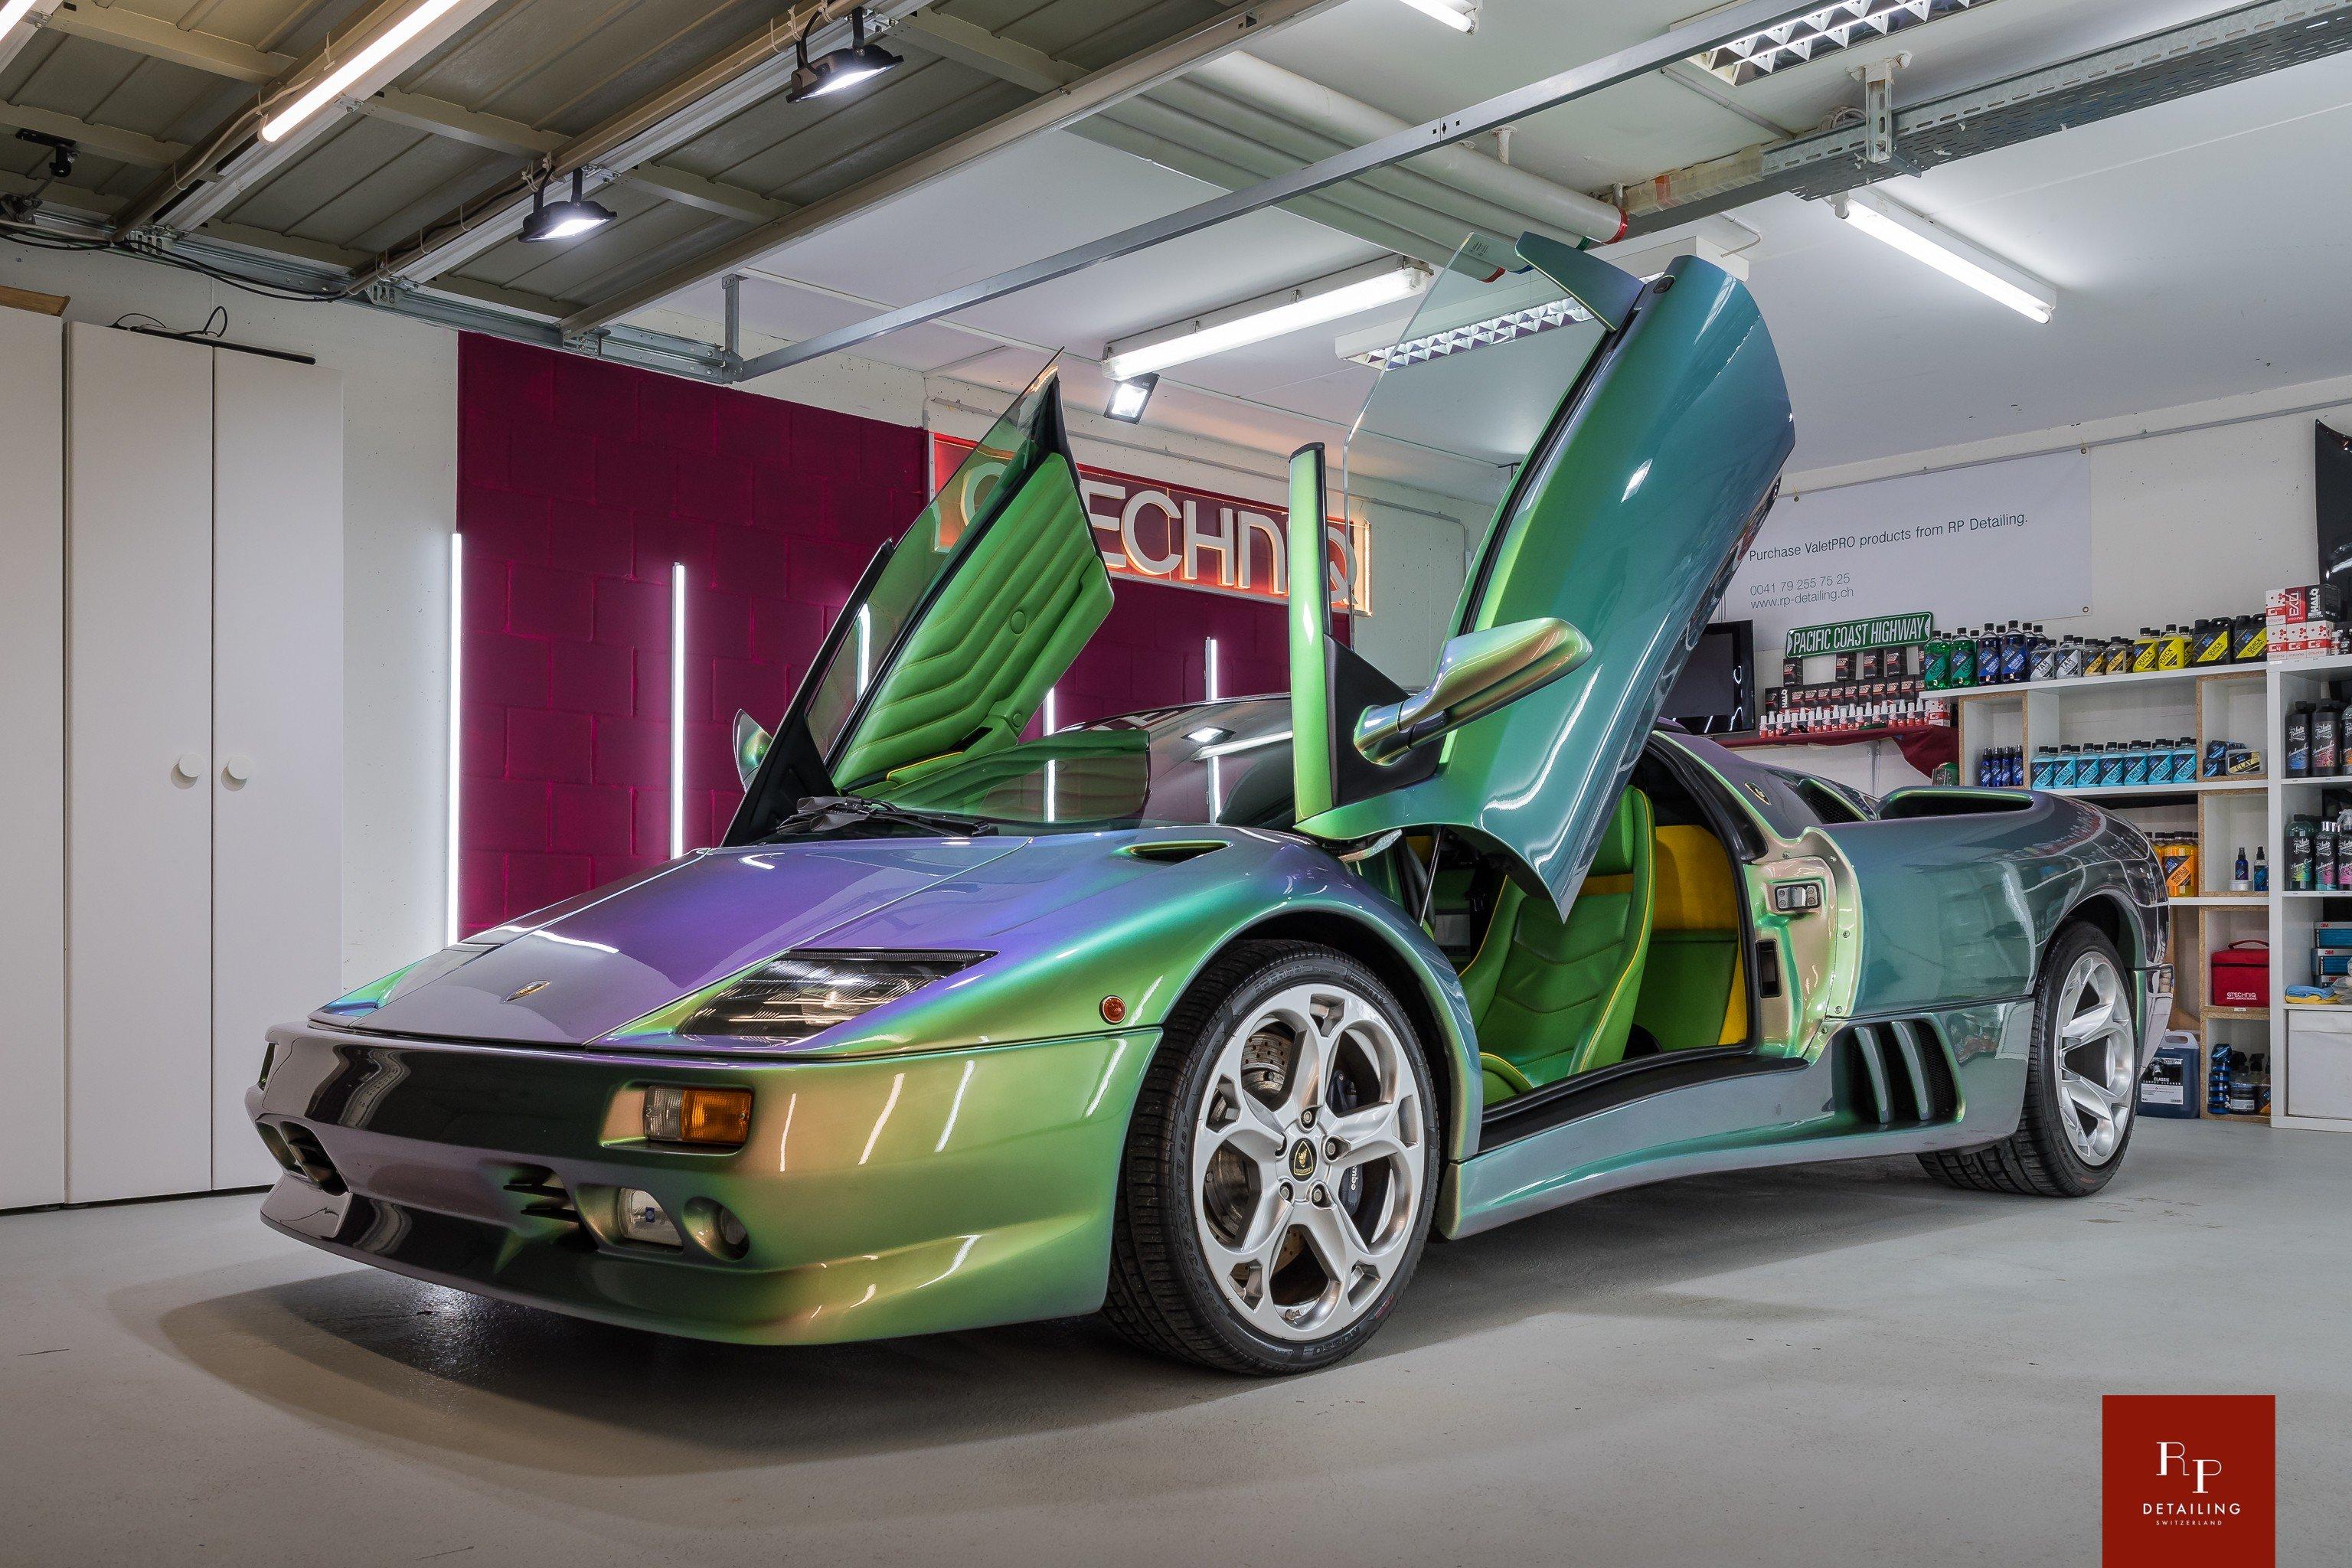 Lamborghini Diablo VT Roadster by rp-detailing